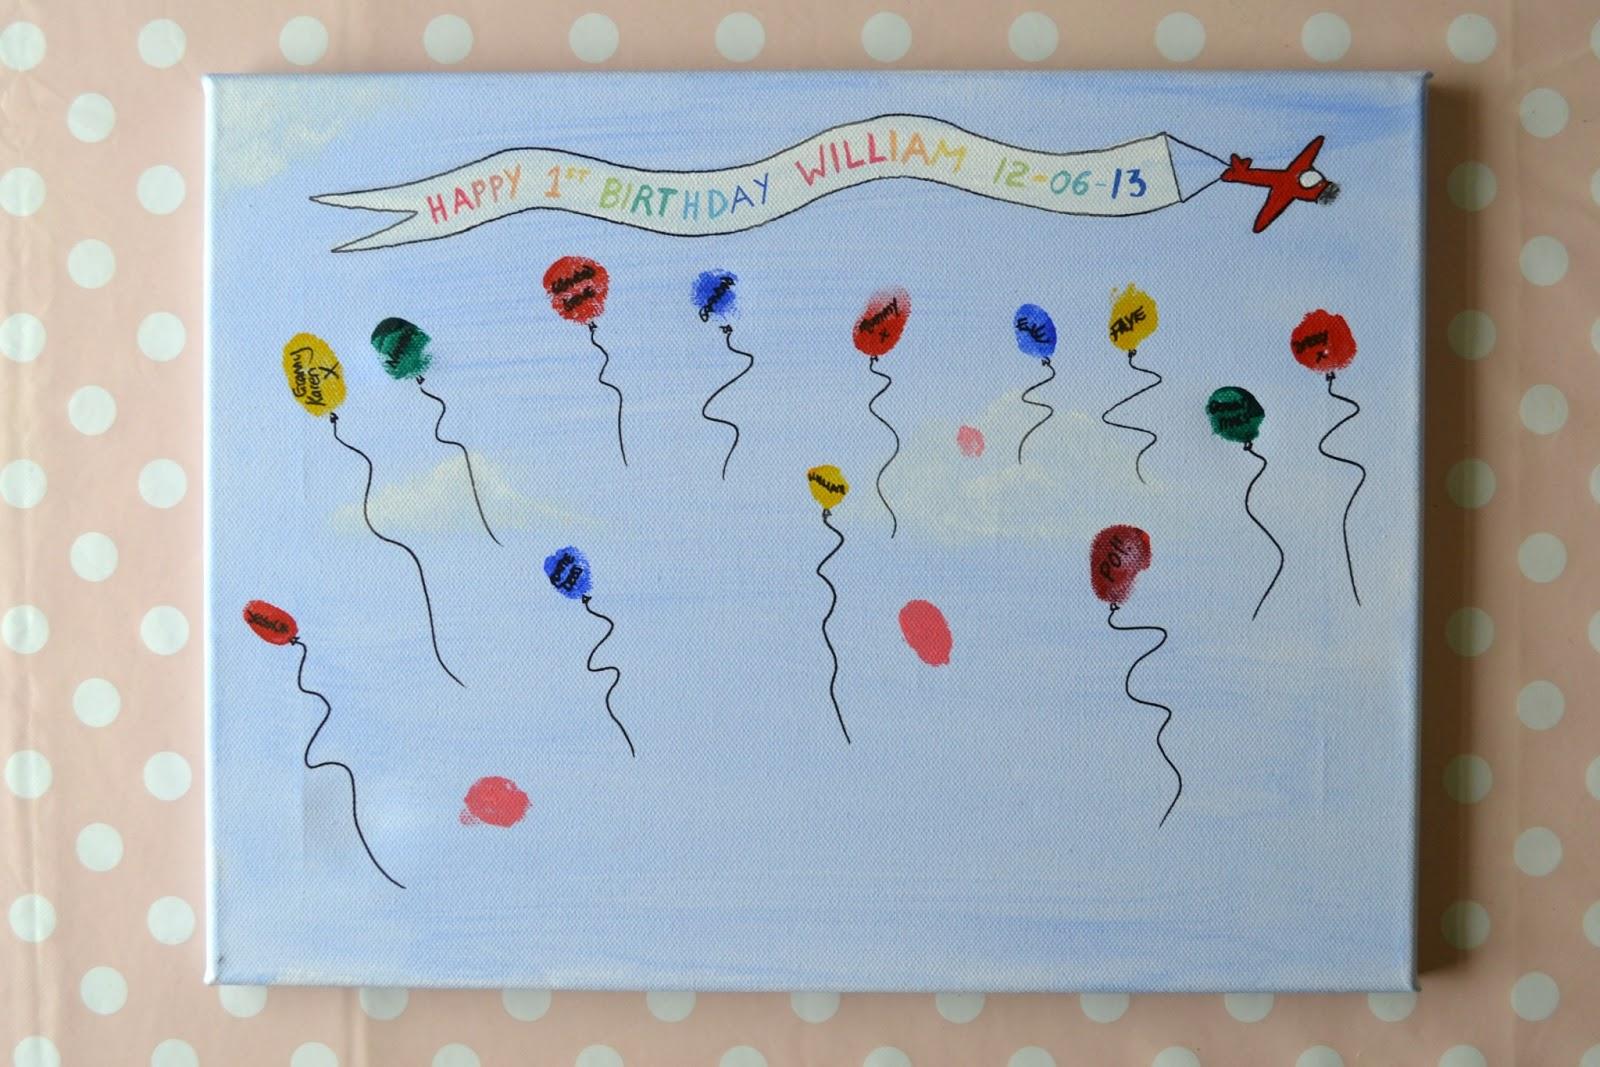 Williams First Birthday DIY Memory Canvas